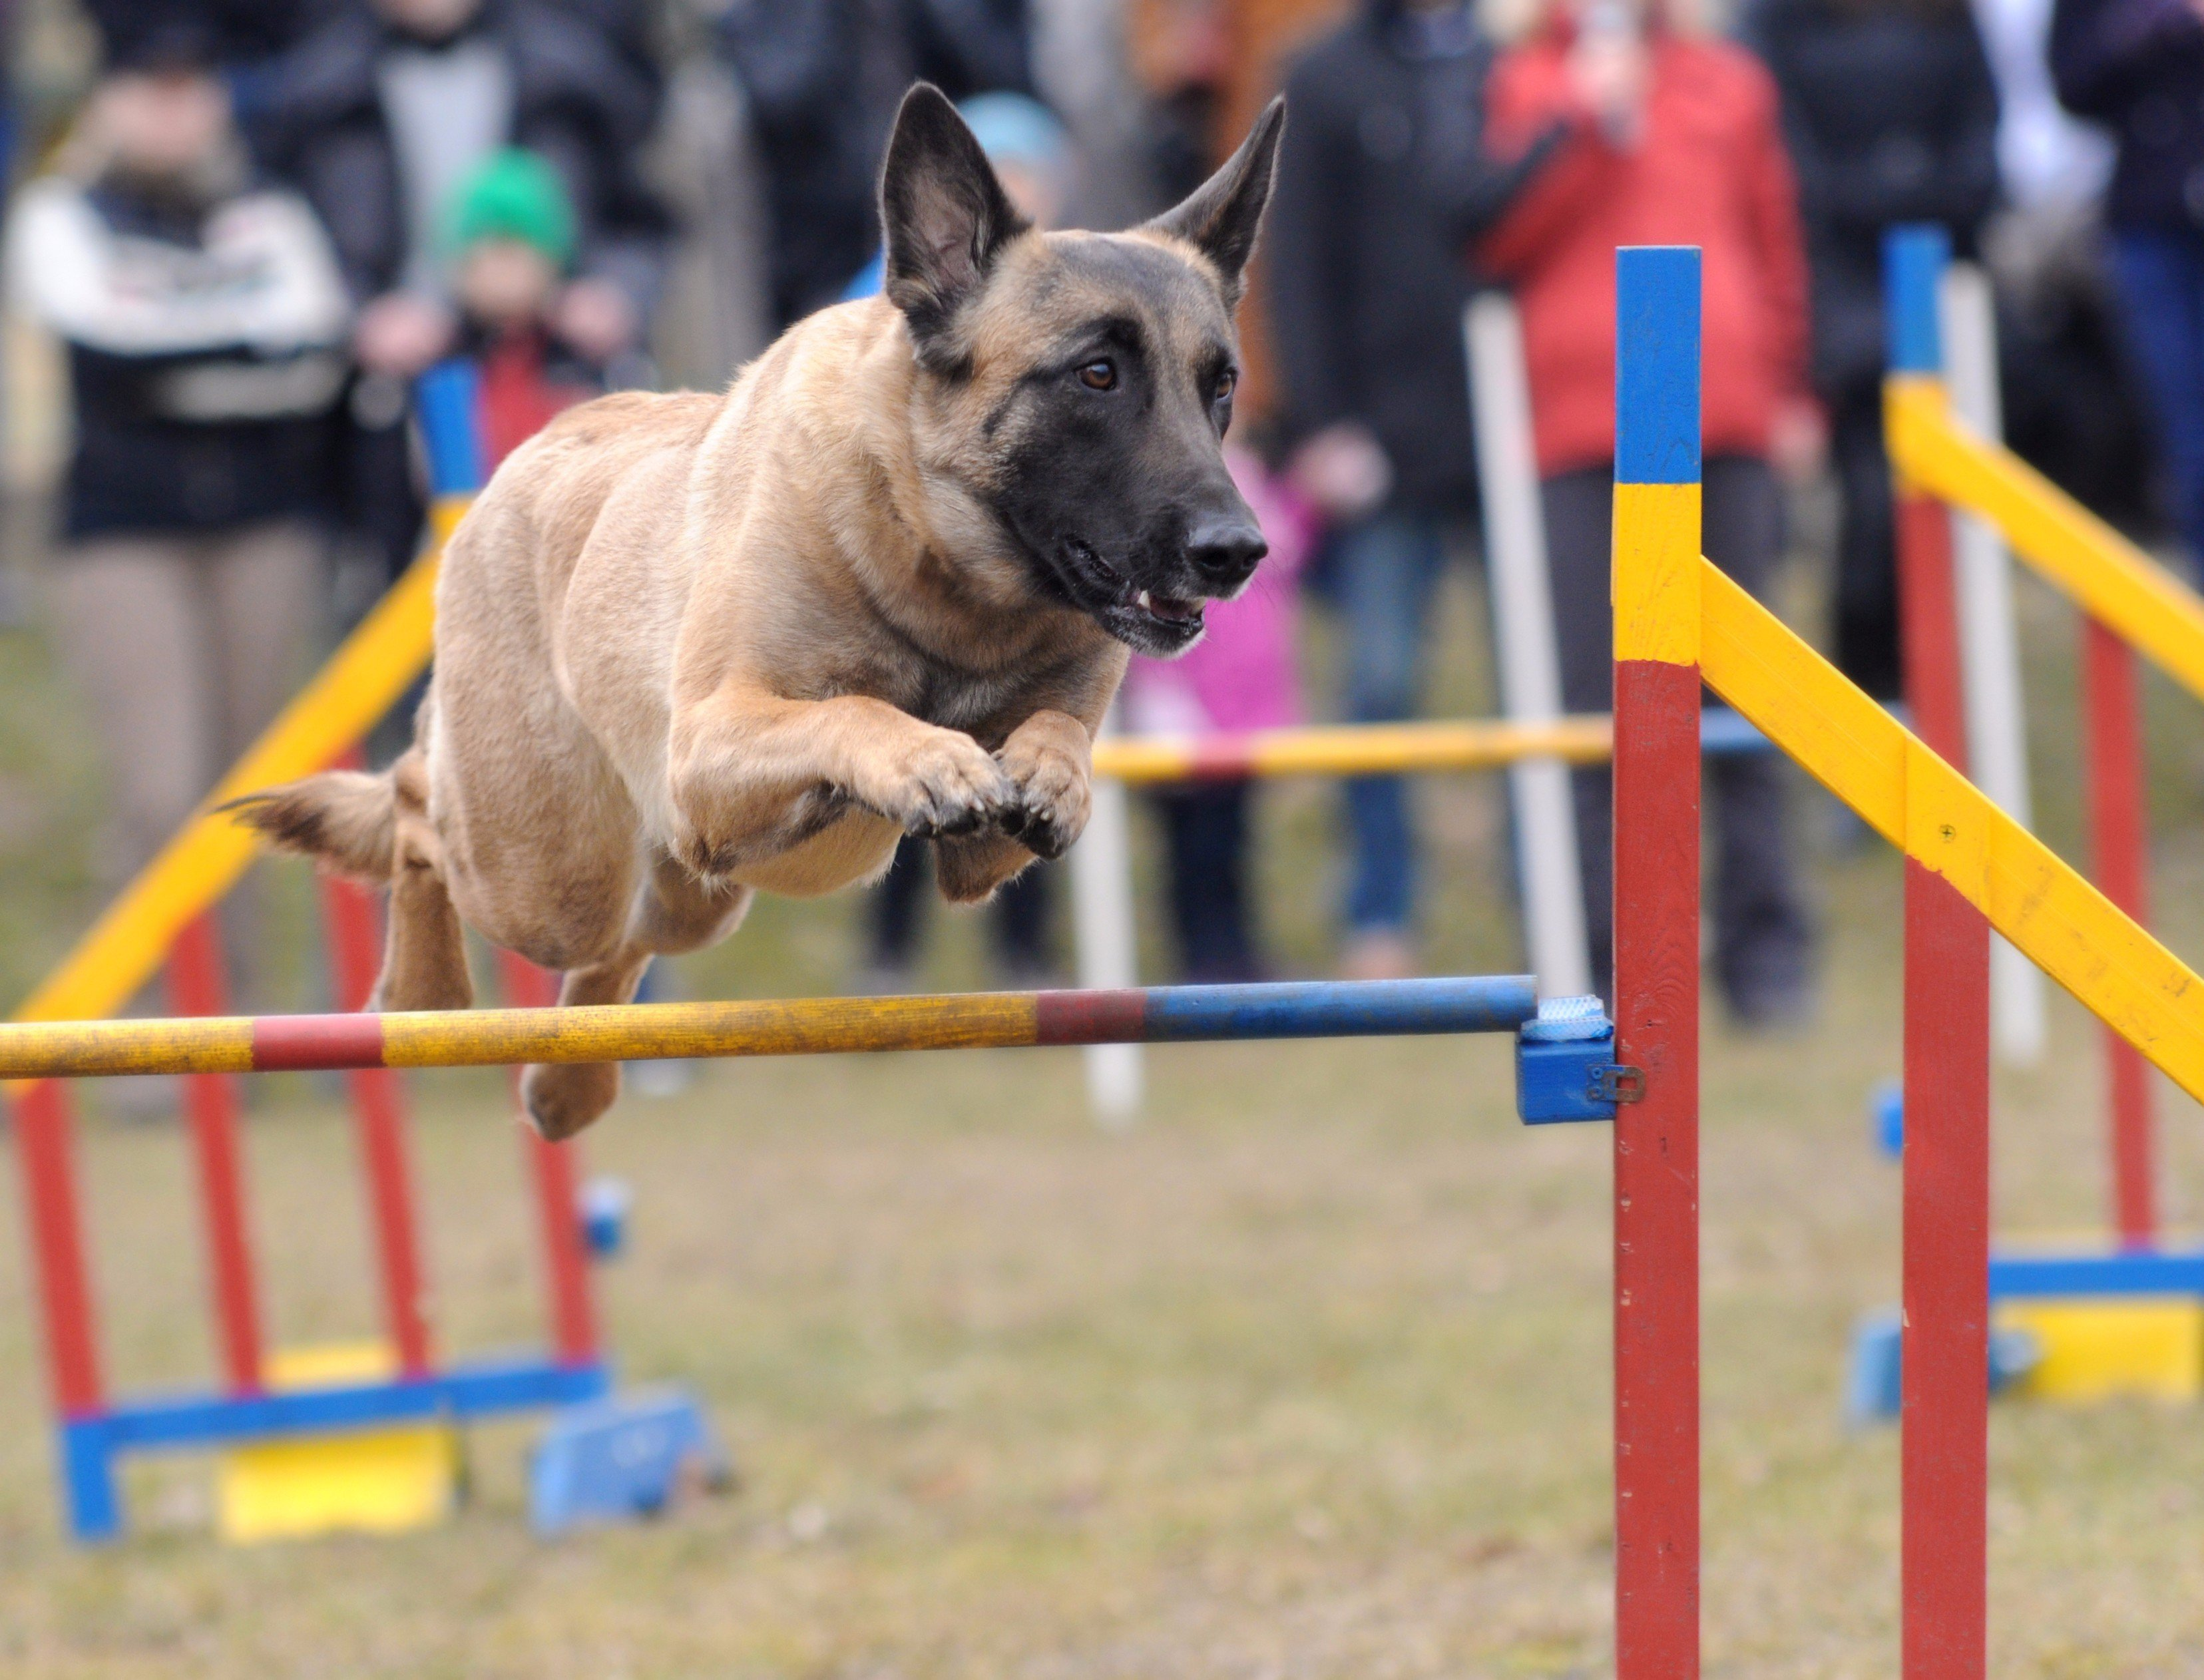 Dog training Wigan, Dog trainer Wigan, Dog Training Ormskirk, Dog Trainer Ormskirk